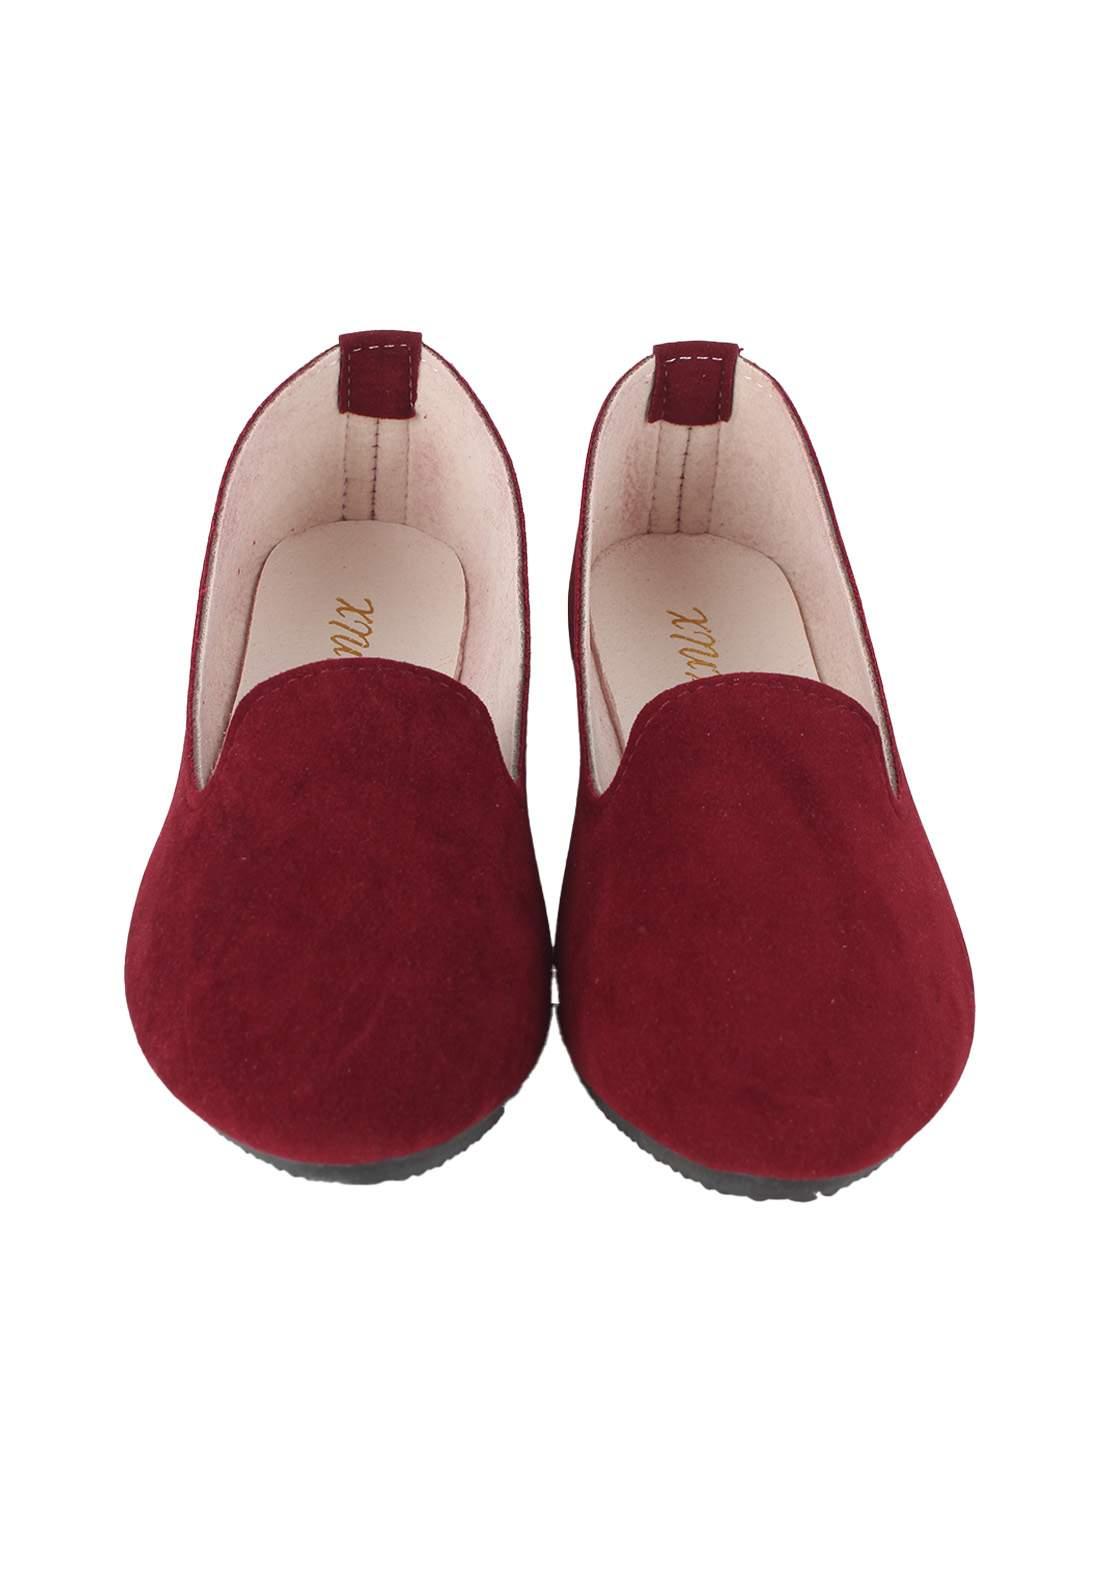 حذاء نسائي فلات ماروني اللون